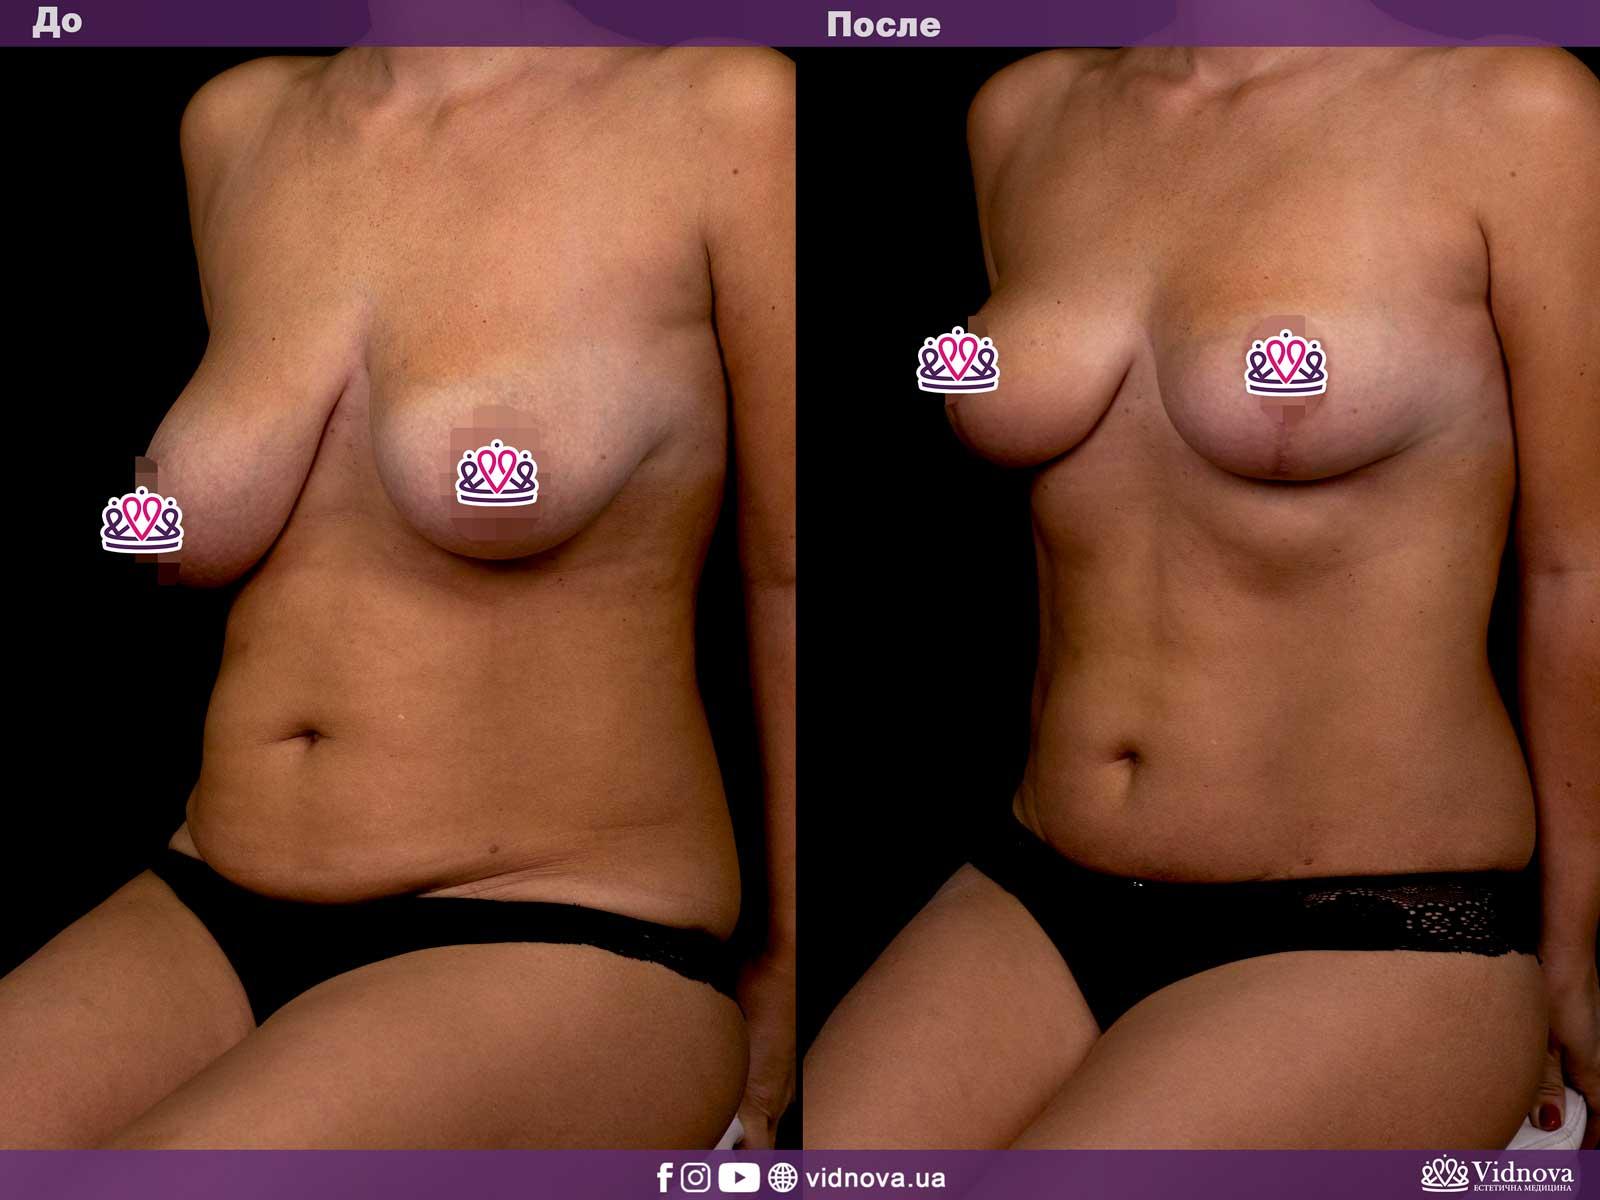 Подтяжка груди: Фото ДО и ПОСЛЕ - Пример №2-1 - Клиника Vidnova